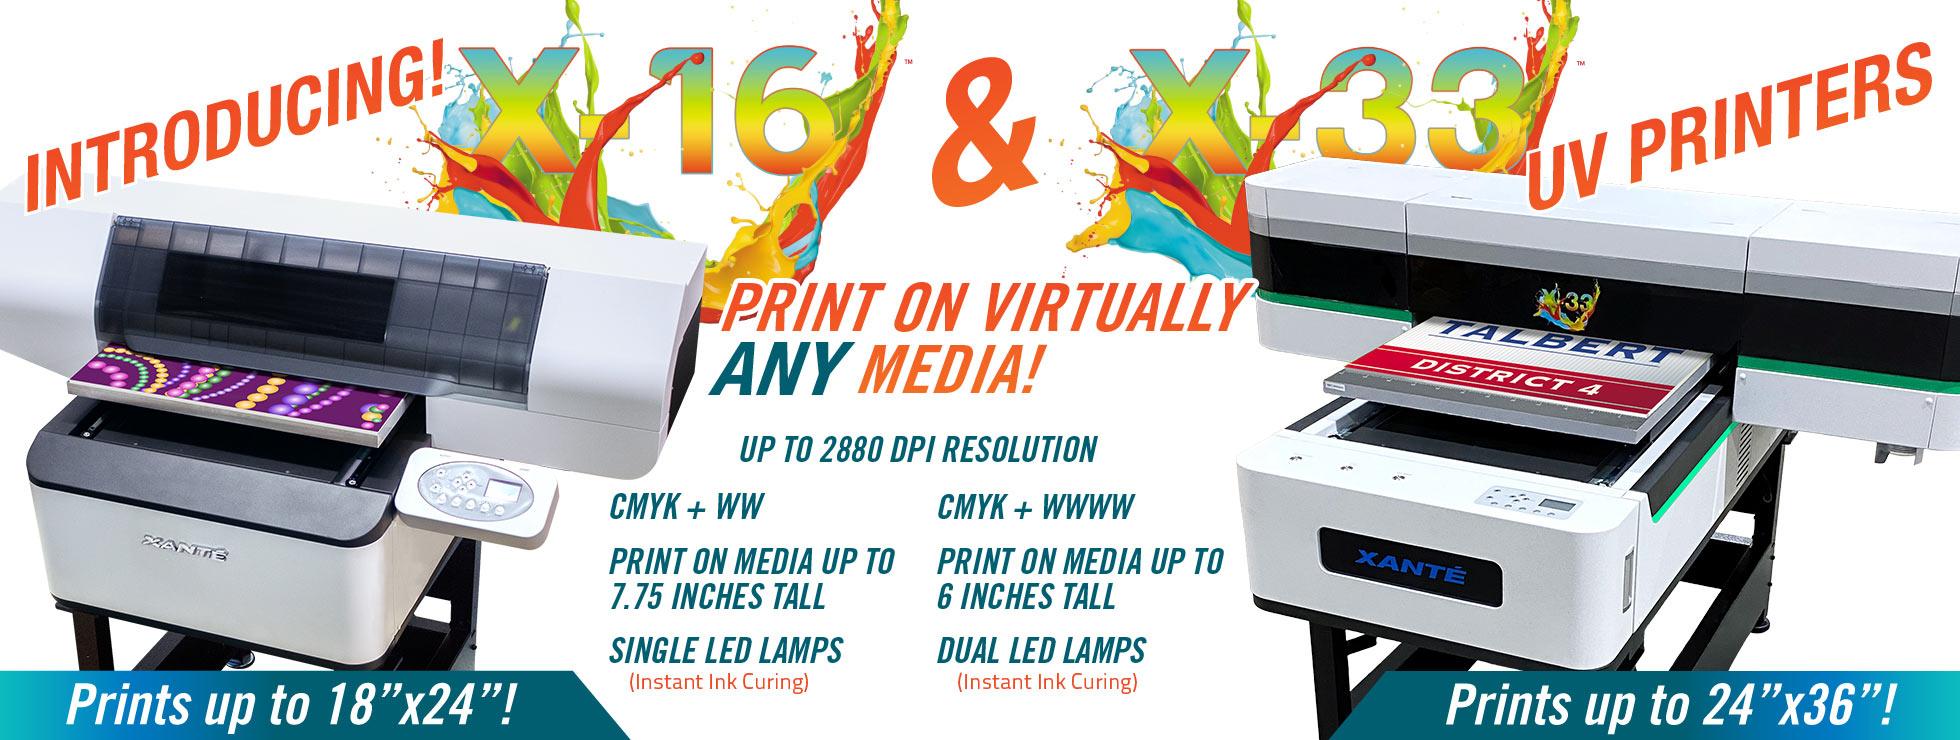 X-16 and X-33 UV Printer